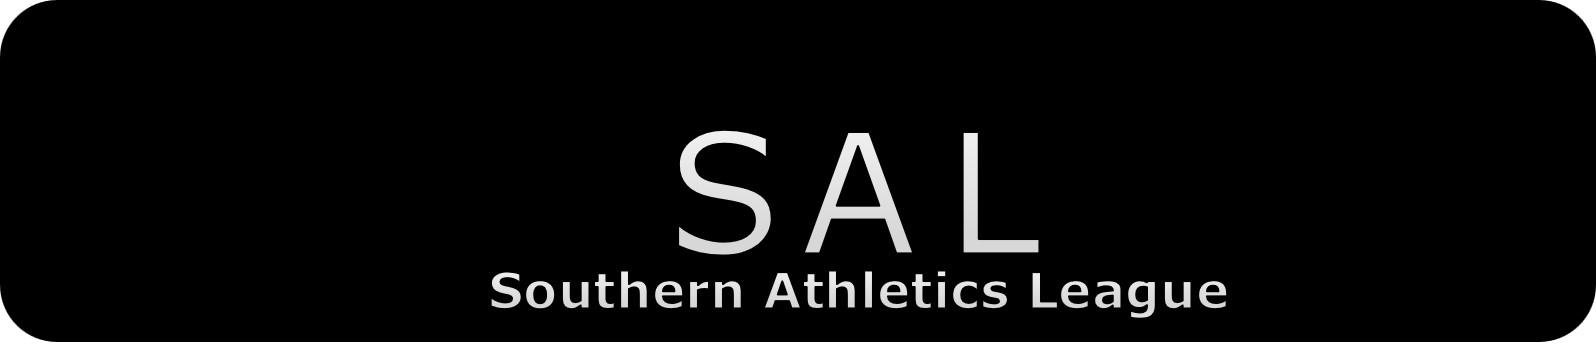 SAL Logo.jpg